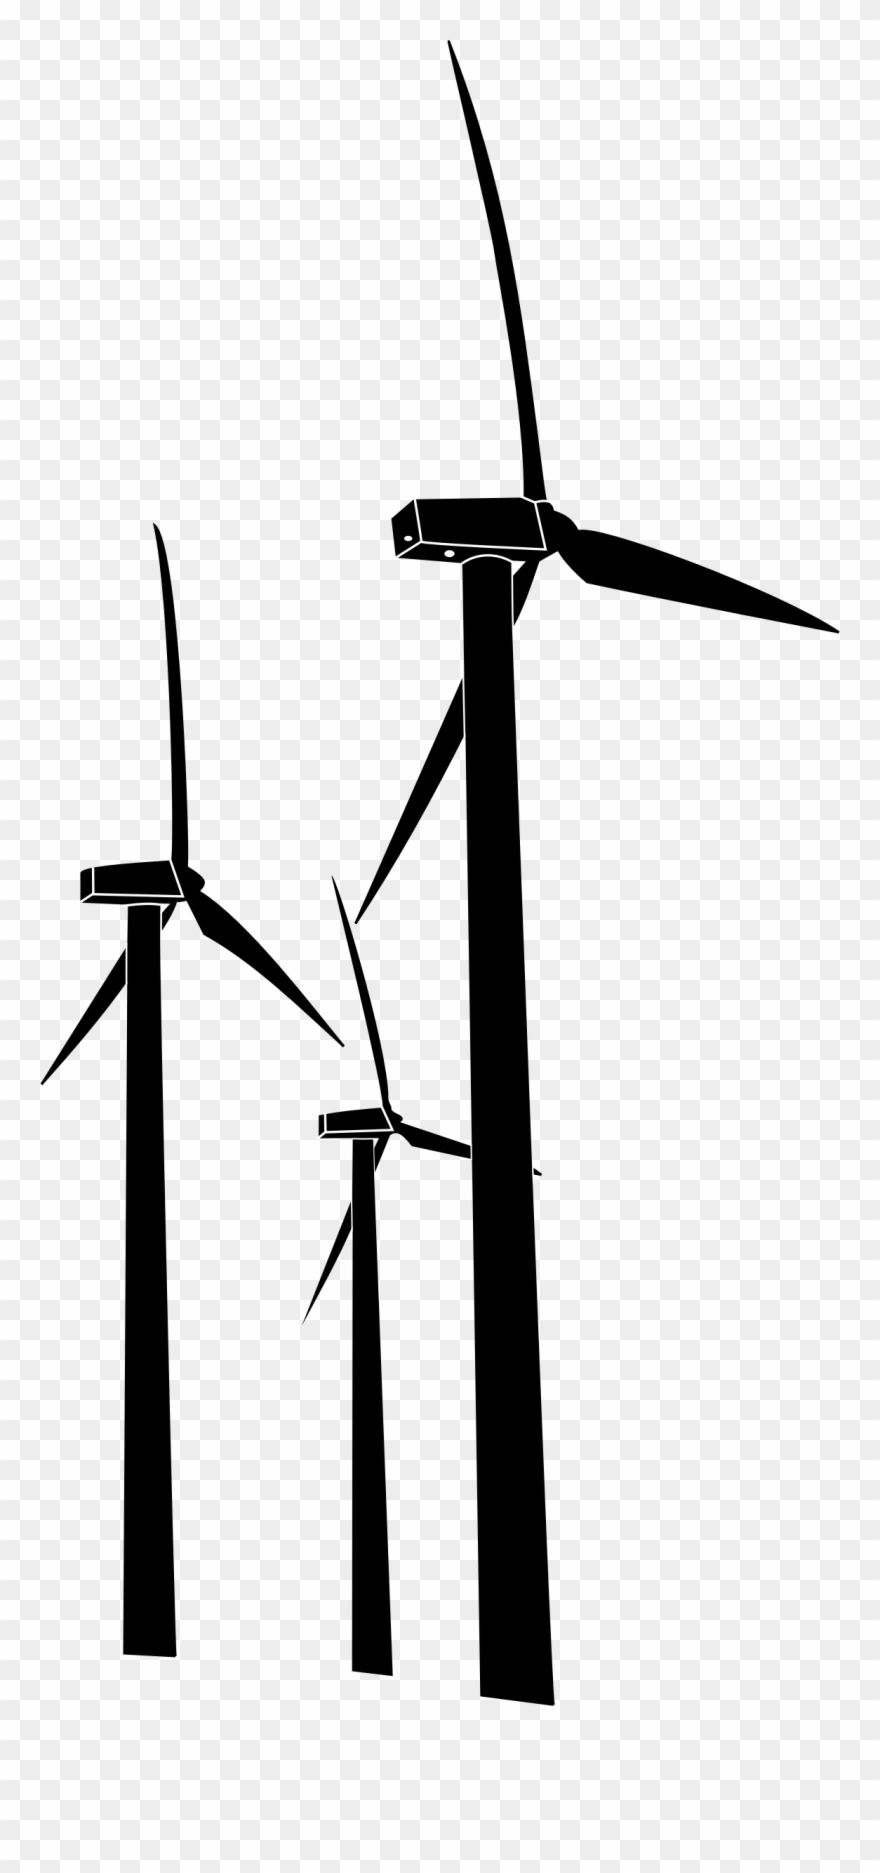 svg royalty free Turbine clipart. Wind turbines clip art